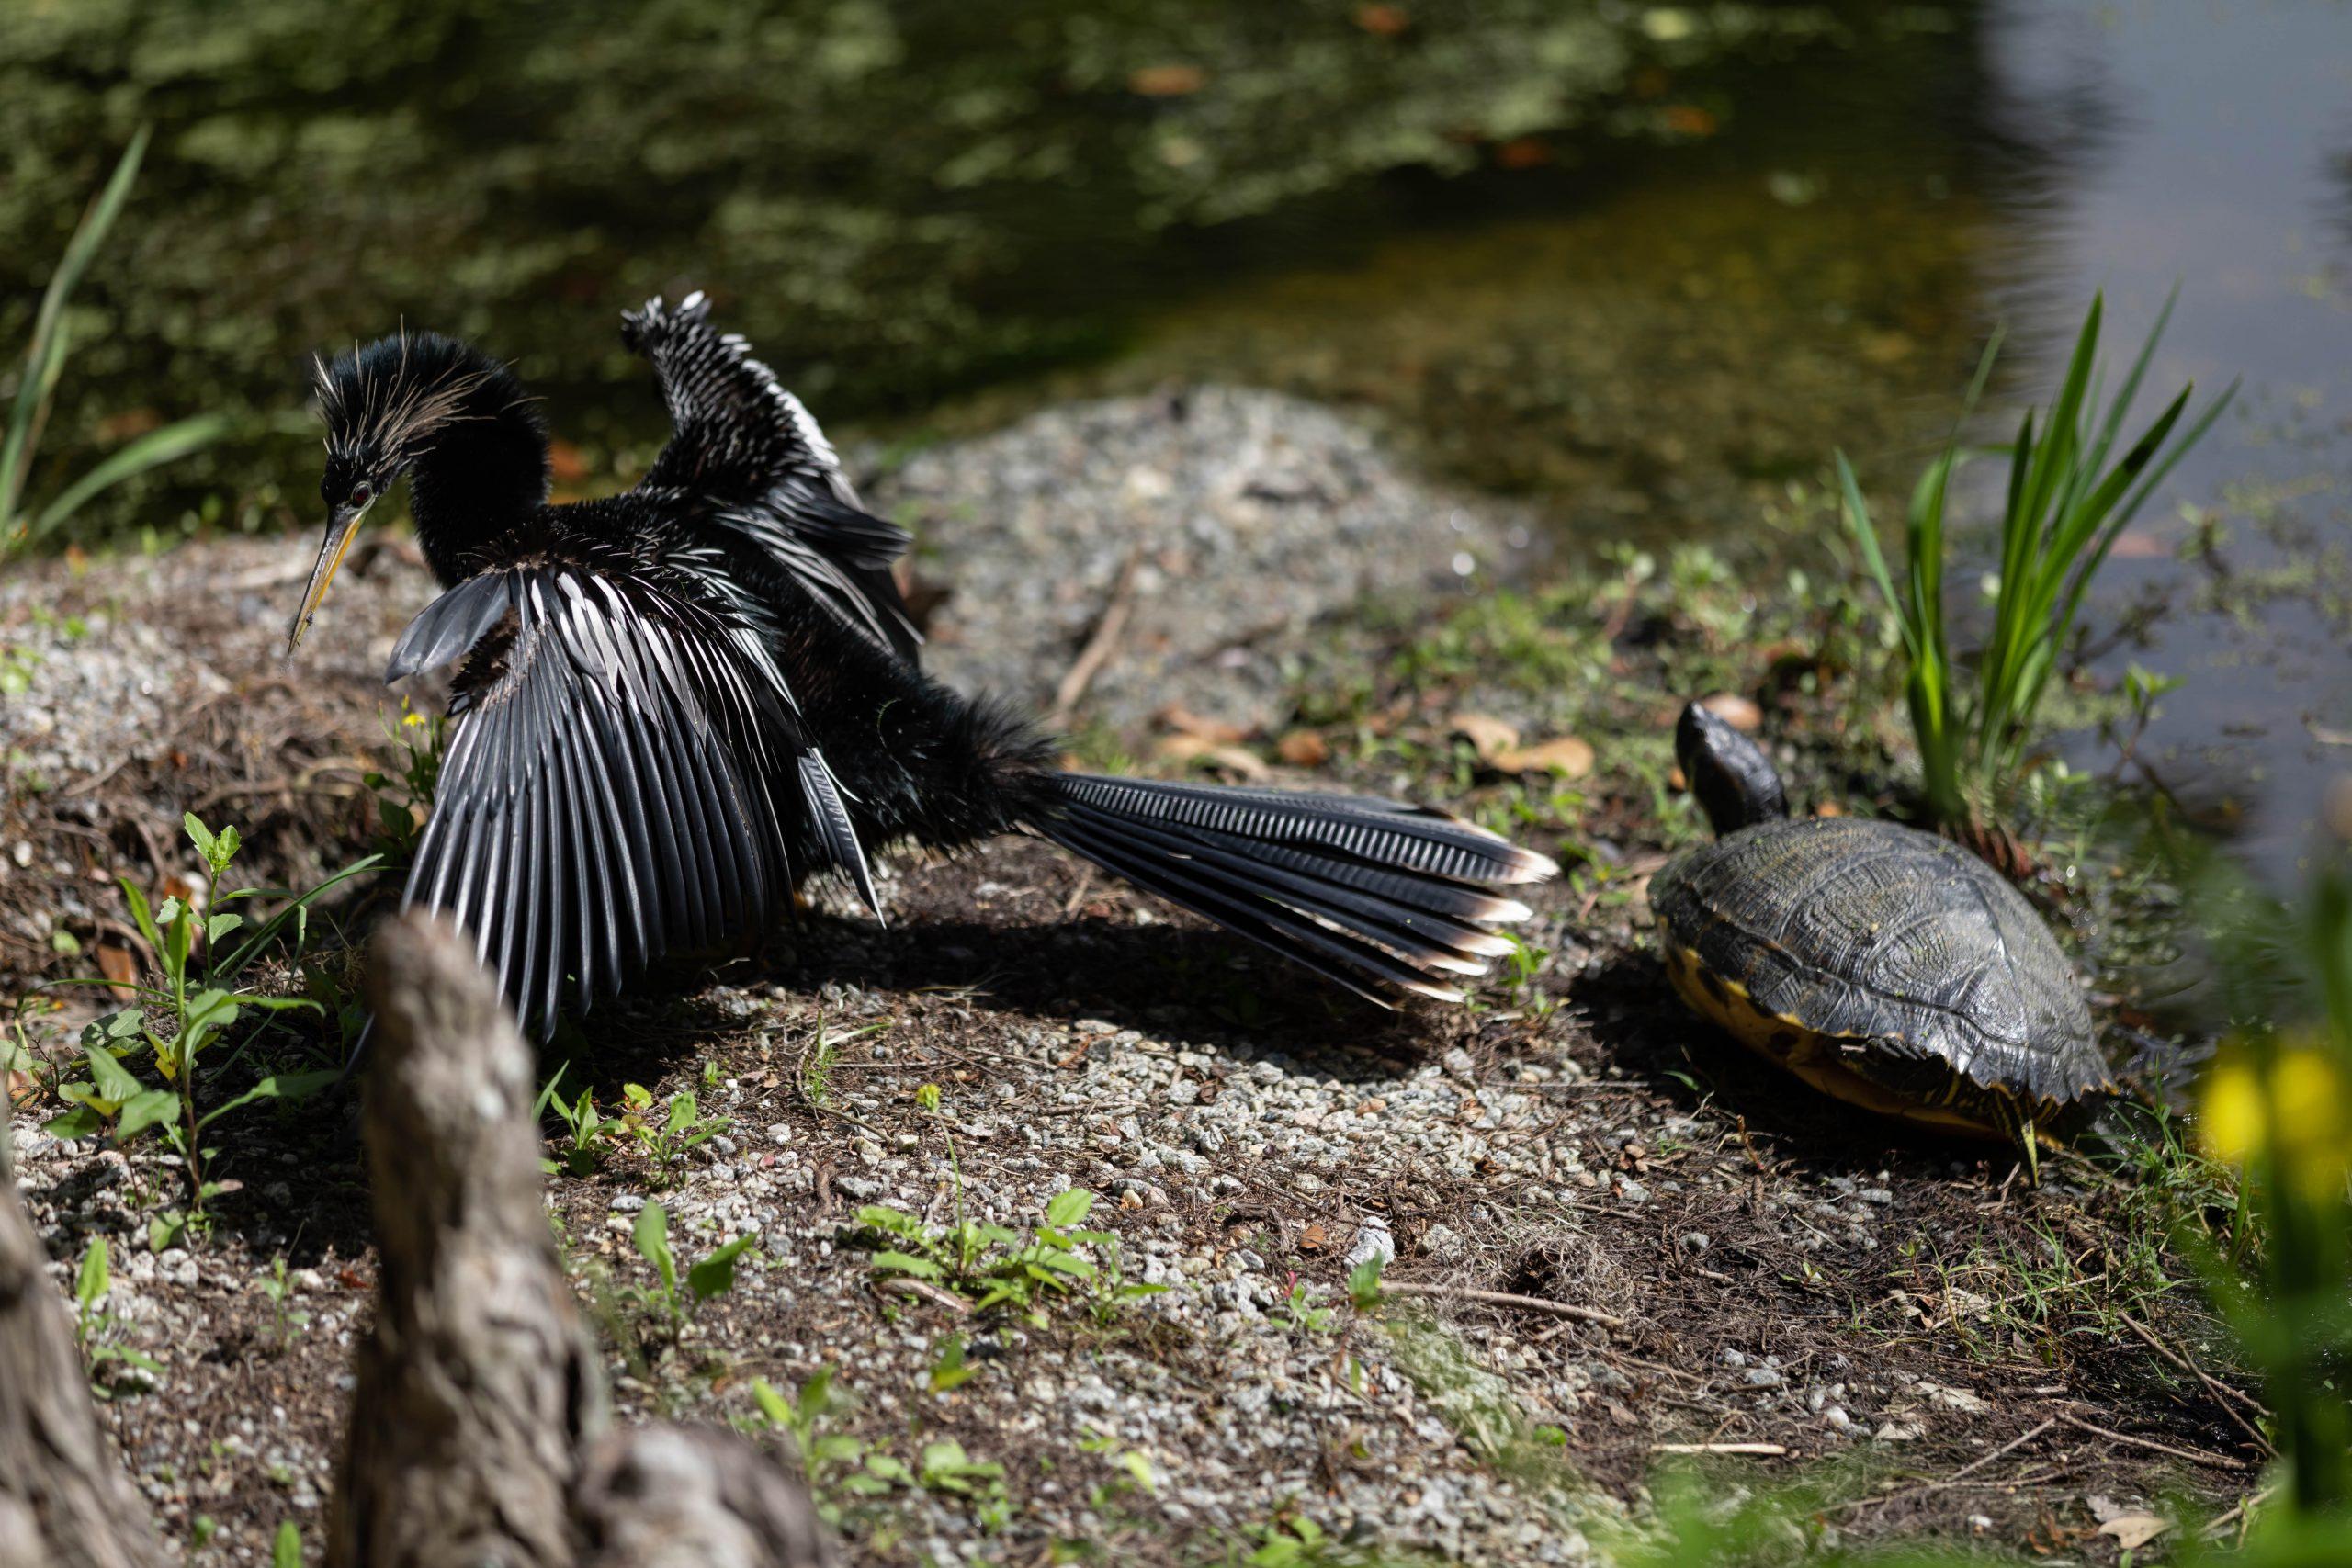 Turtles and Bird at Magnolia Plantation & Gardens in Charleston South Carolina Written & Photographed by Annie Fairfax